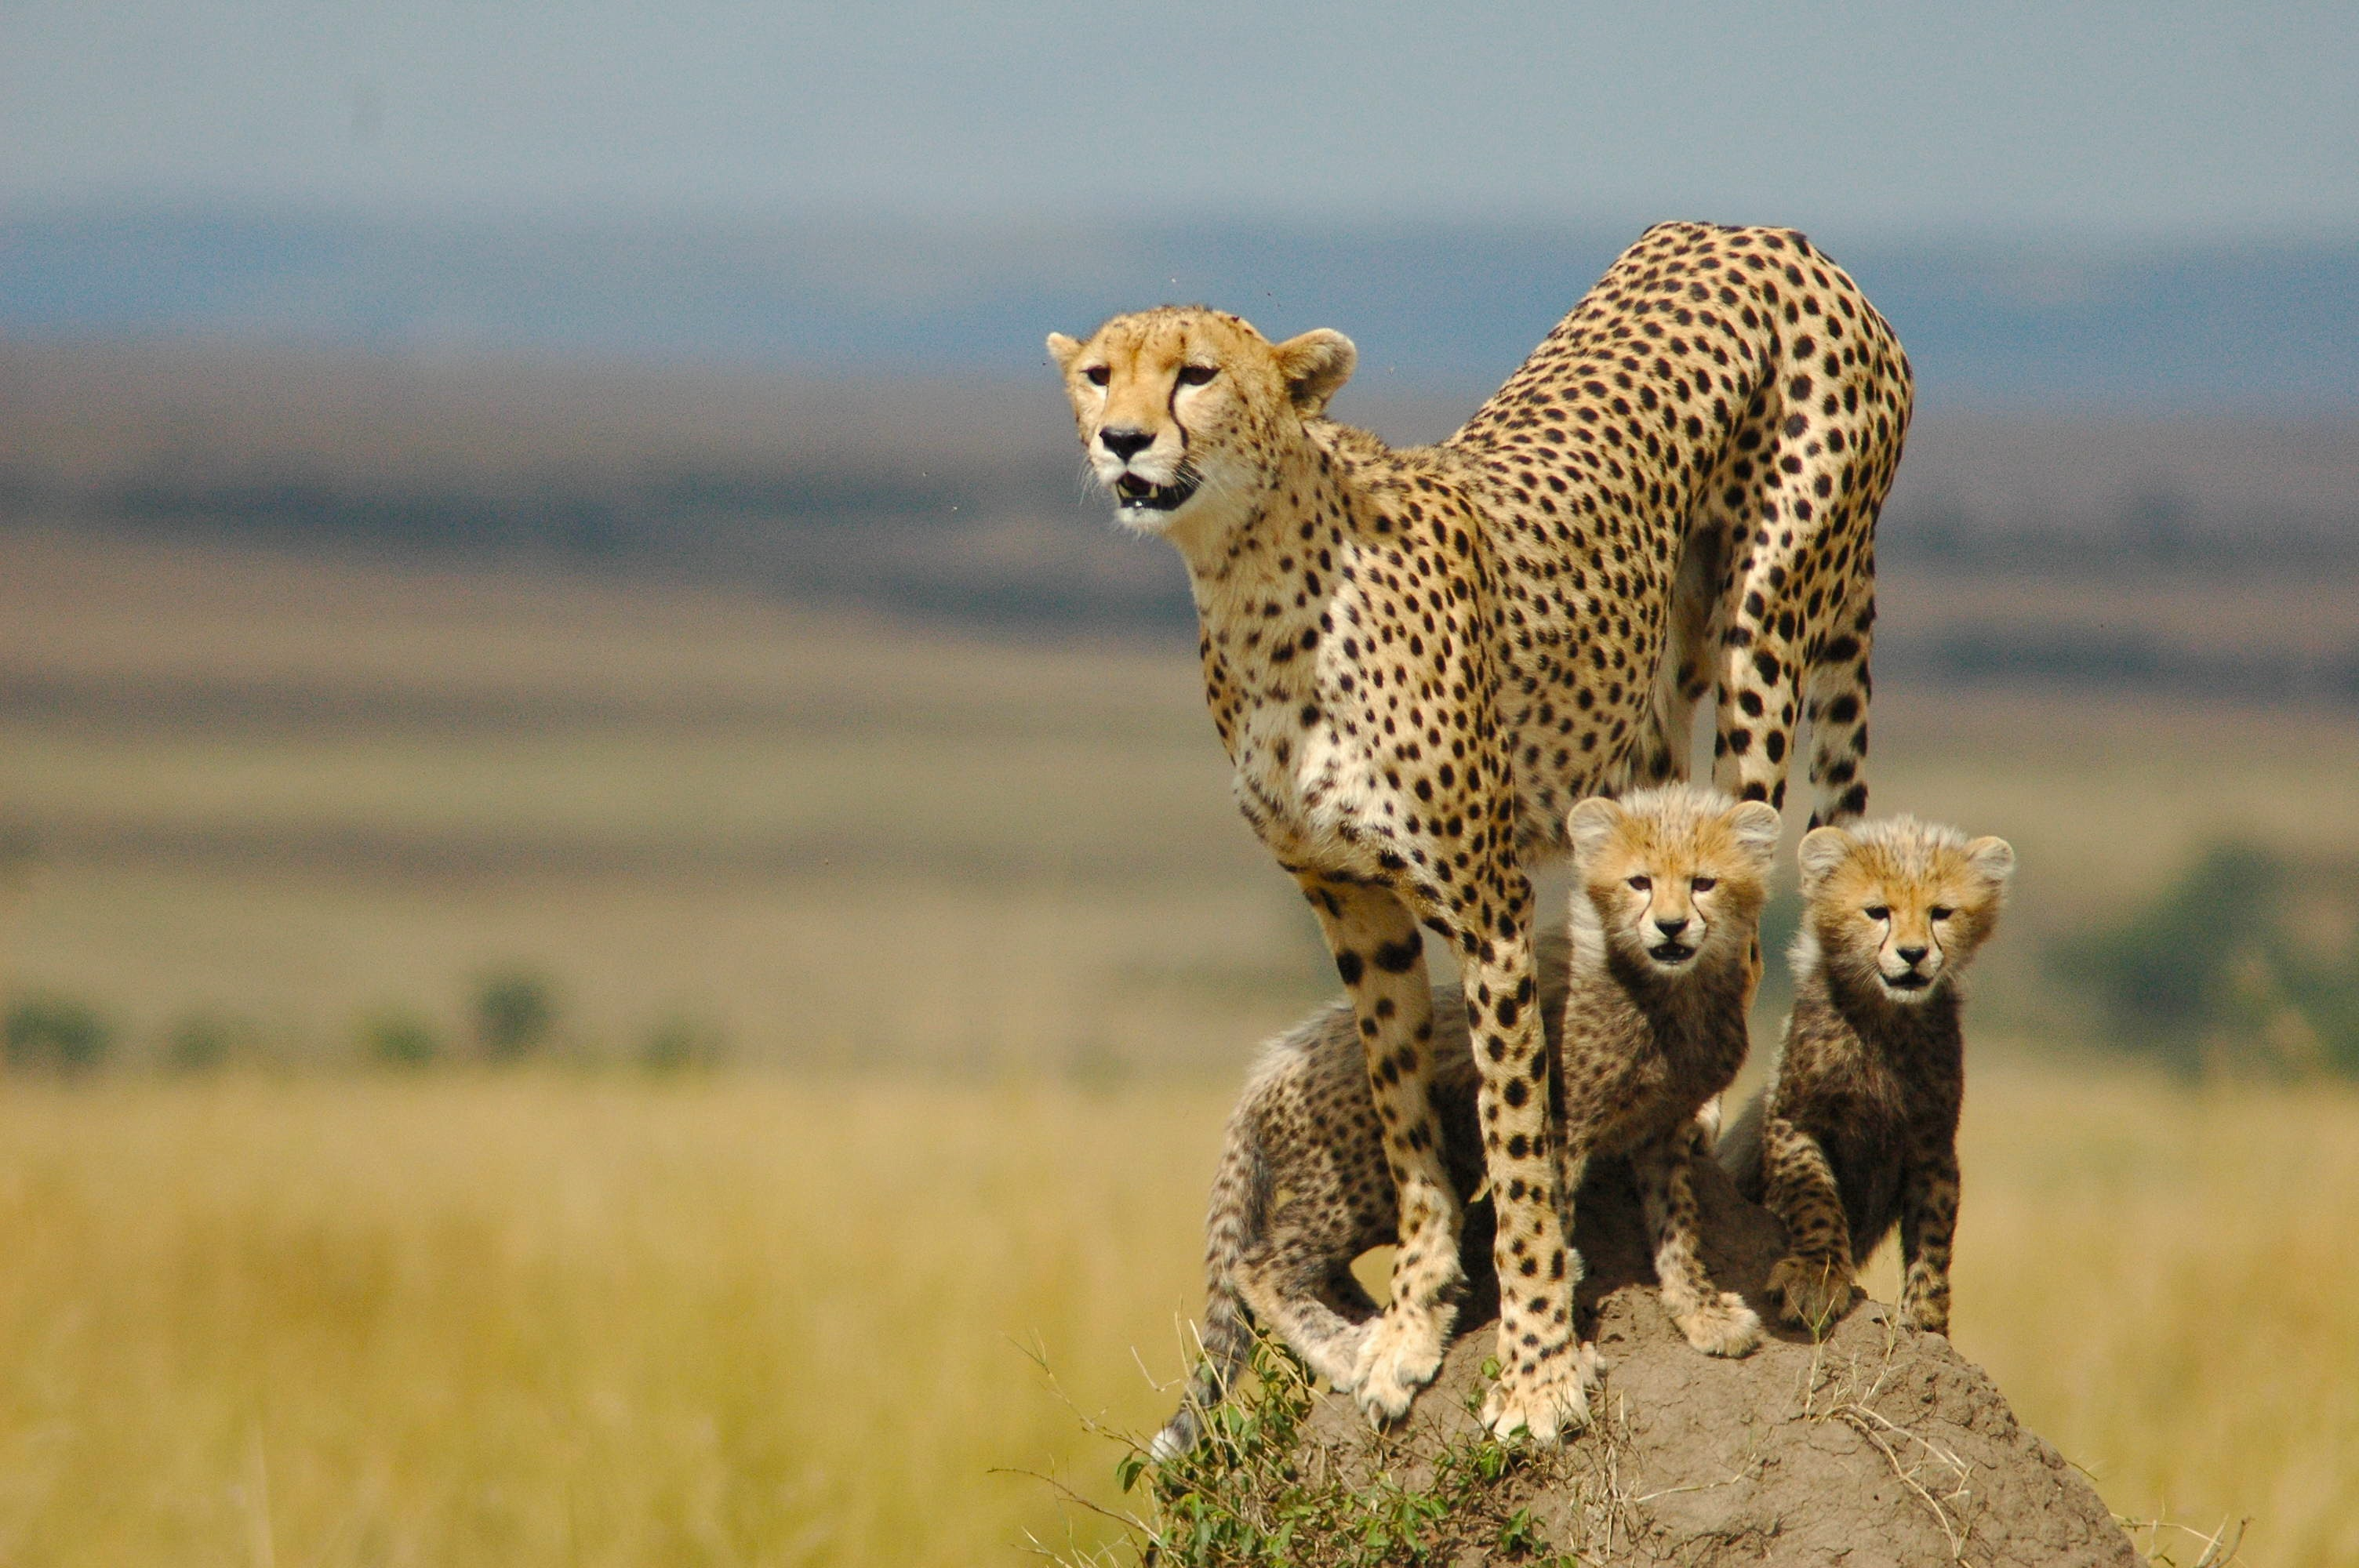 Baby Cheetah Wallpaper Phone - Wickedsa com